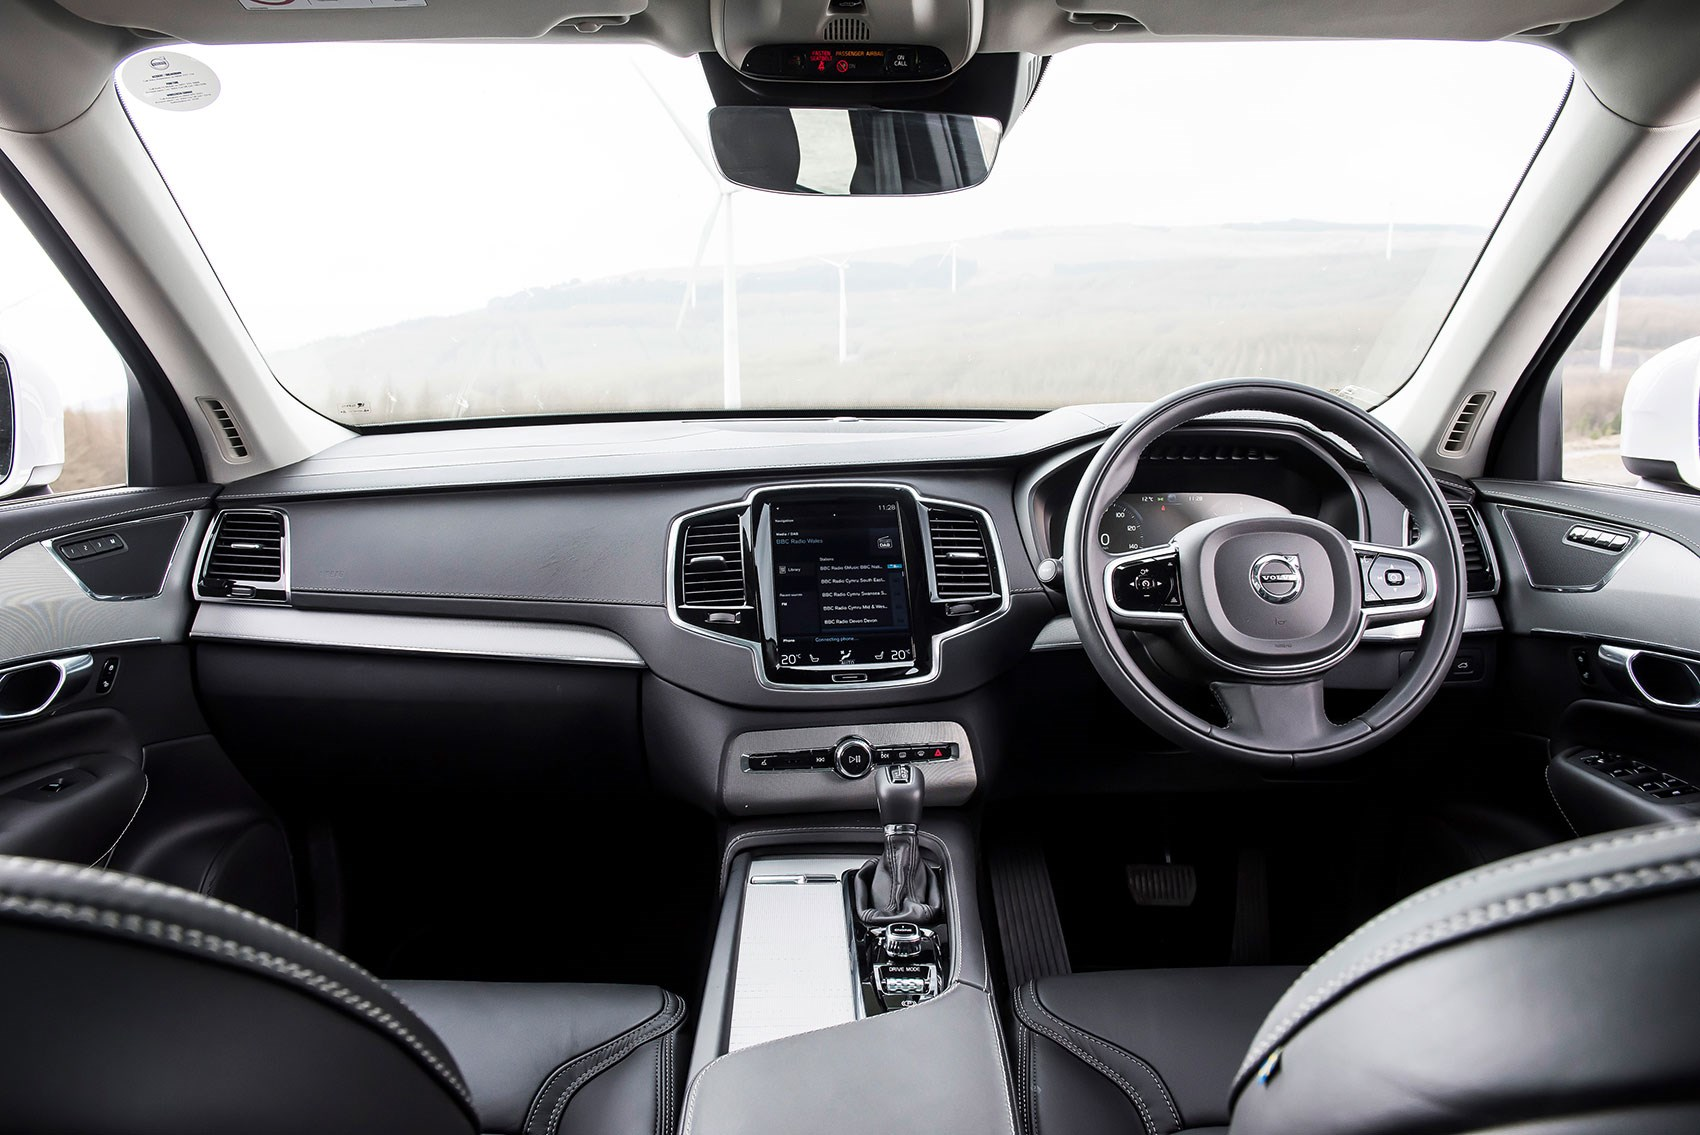 Land Rover Discovery vs Audi Q7 vs BMW X5 vs Volvo XC90 parison